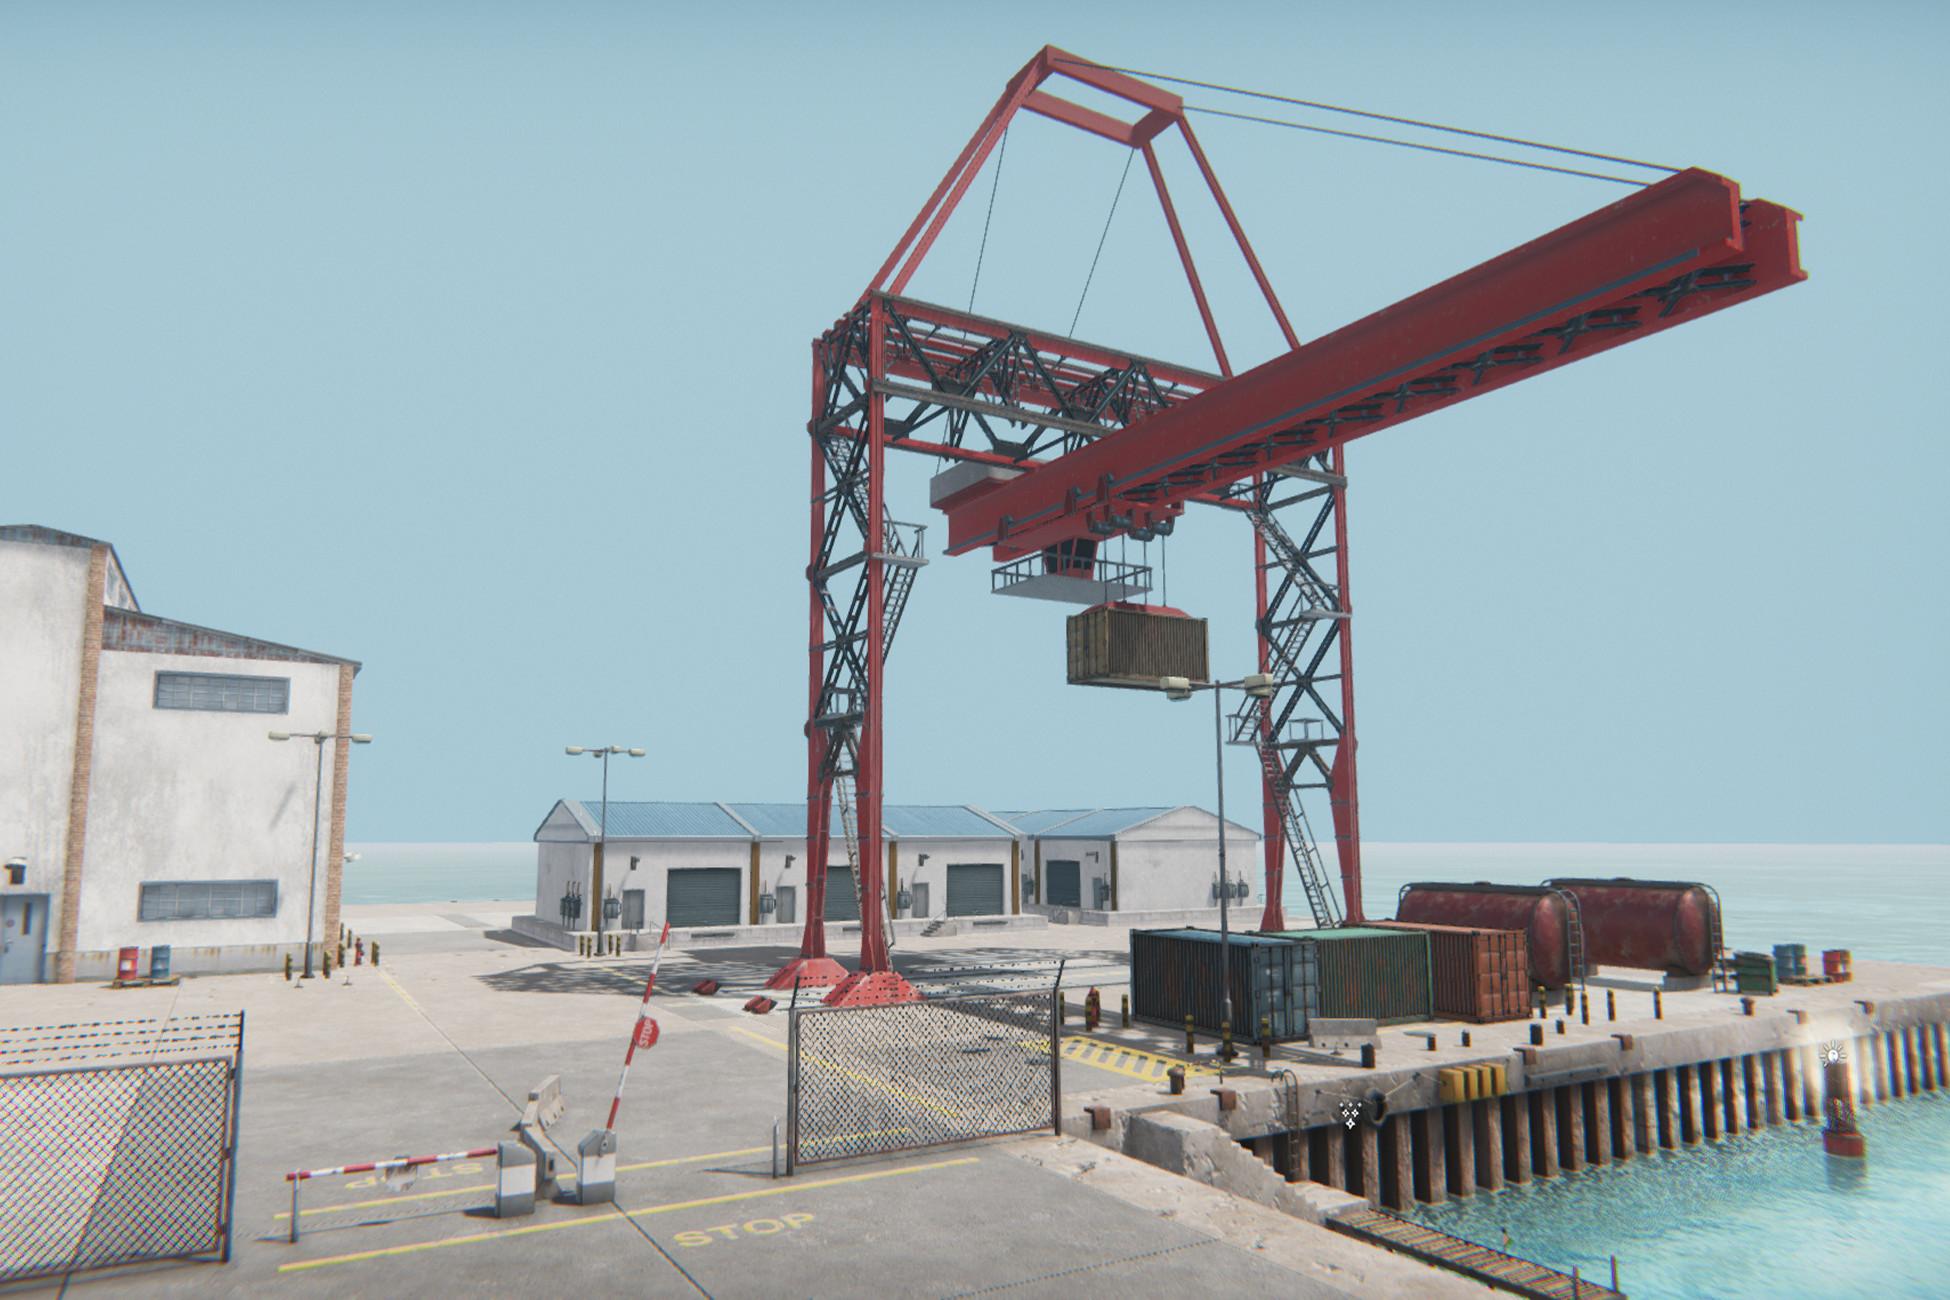 Module Based Harbor Creator